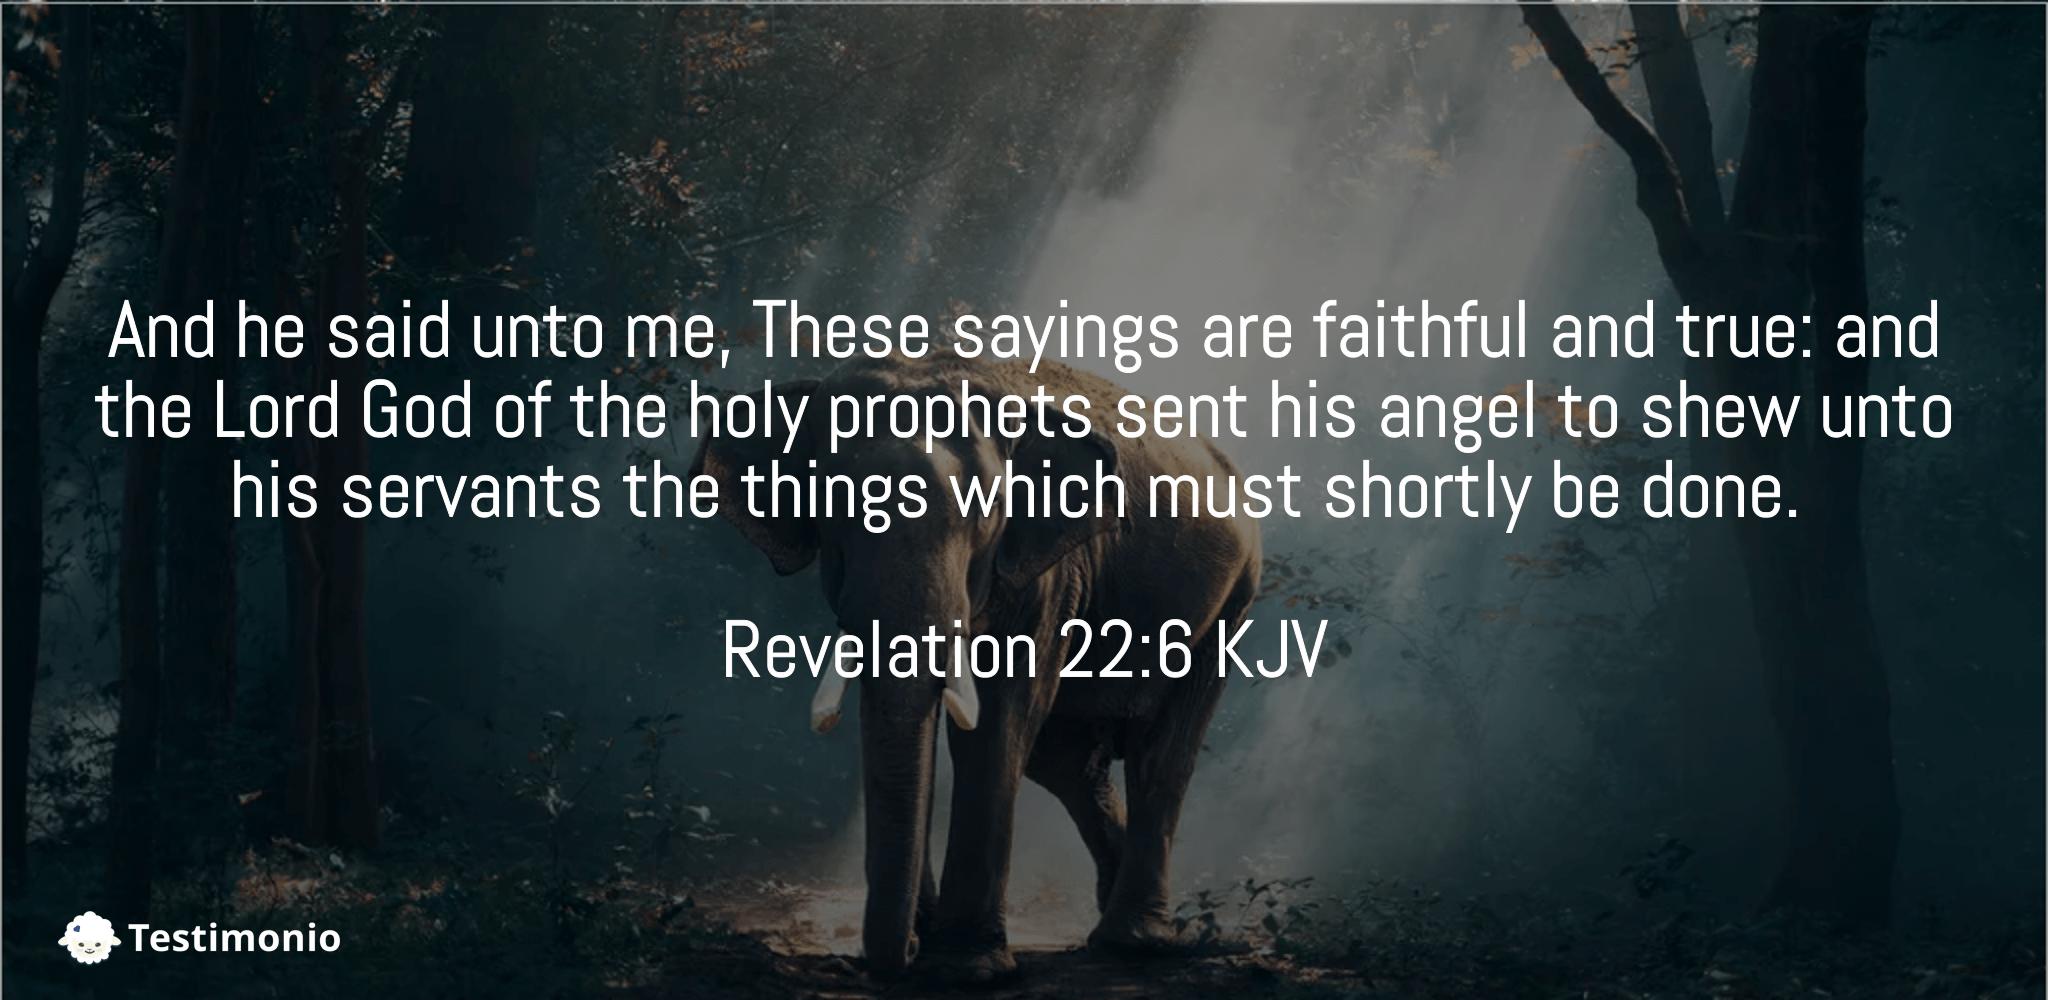 Revelation 22:6